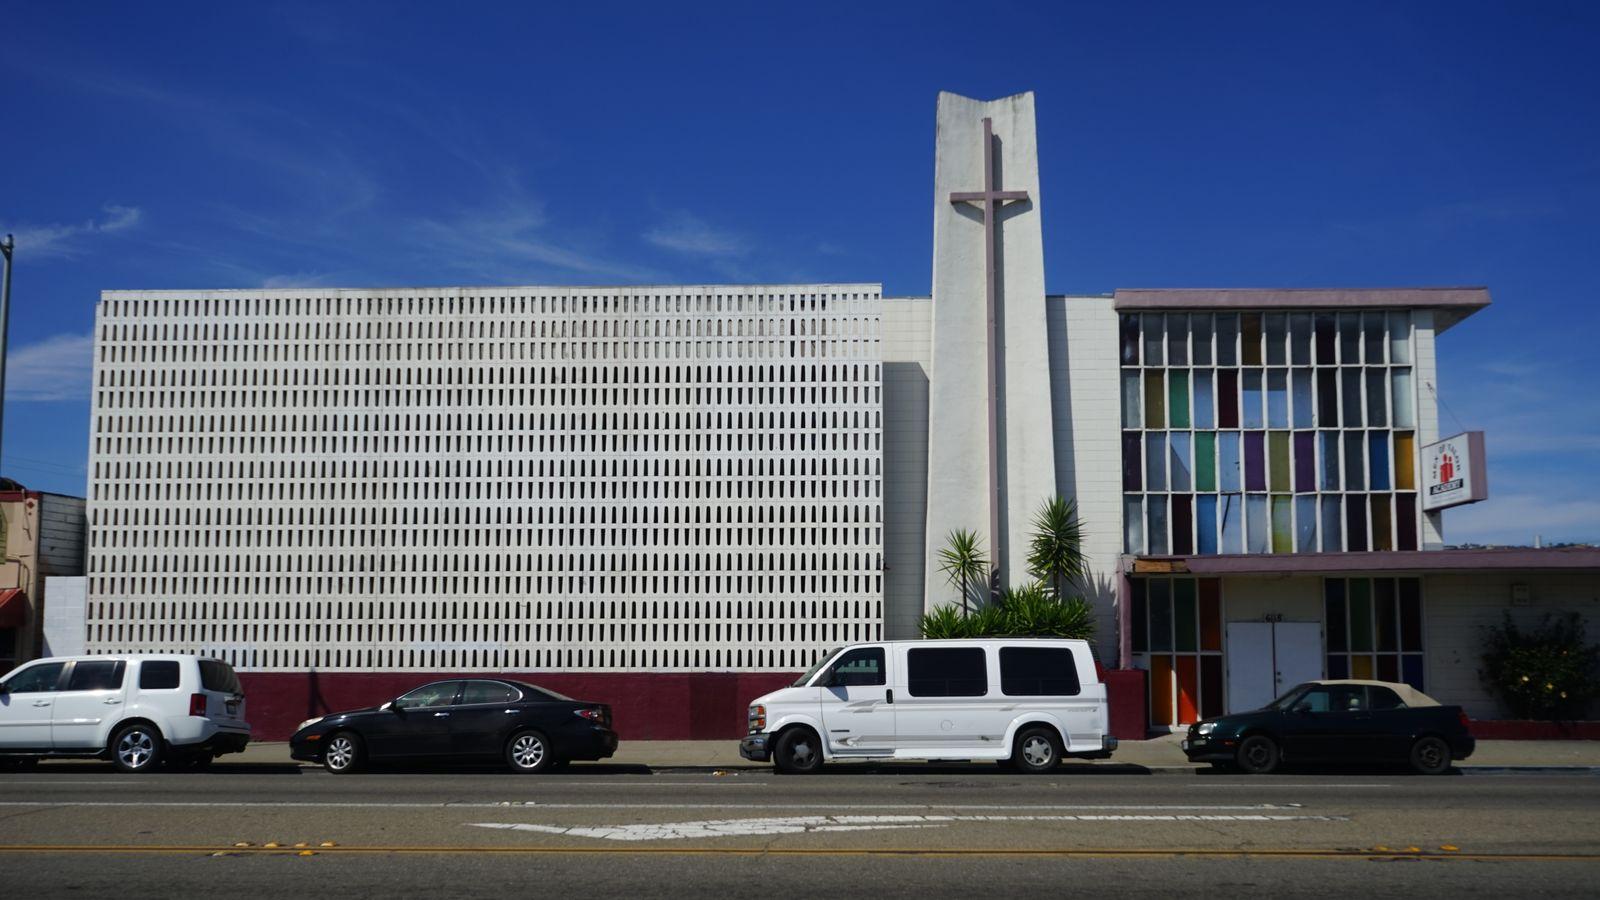 The Oakland Community School building as it appears in 2017